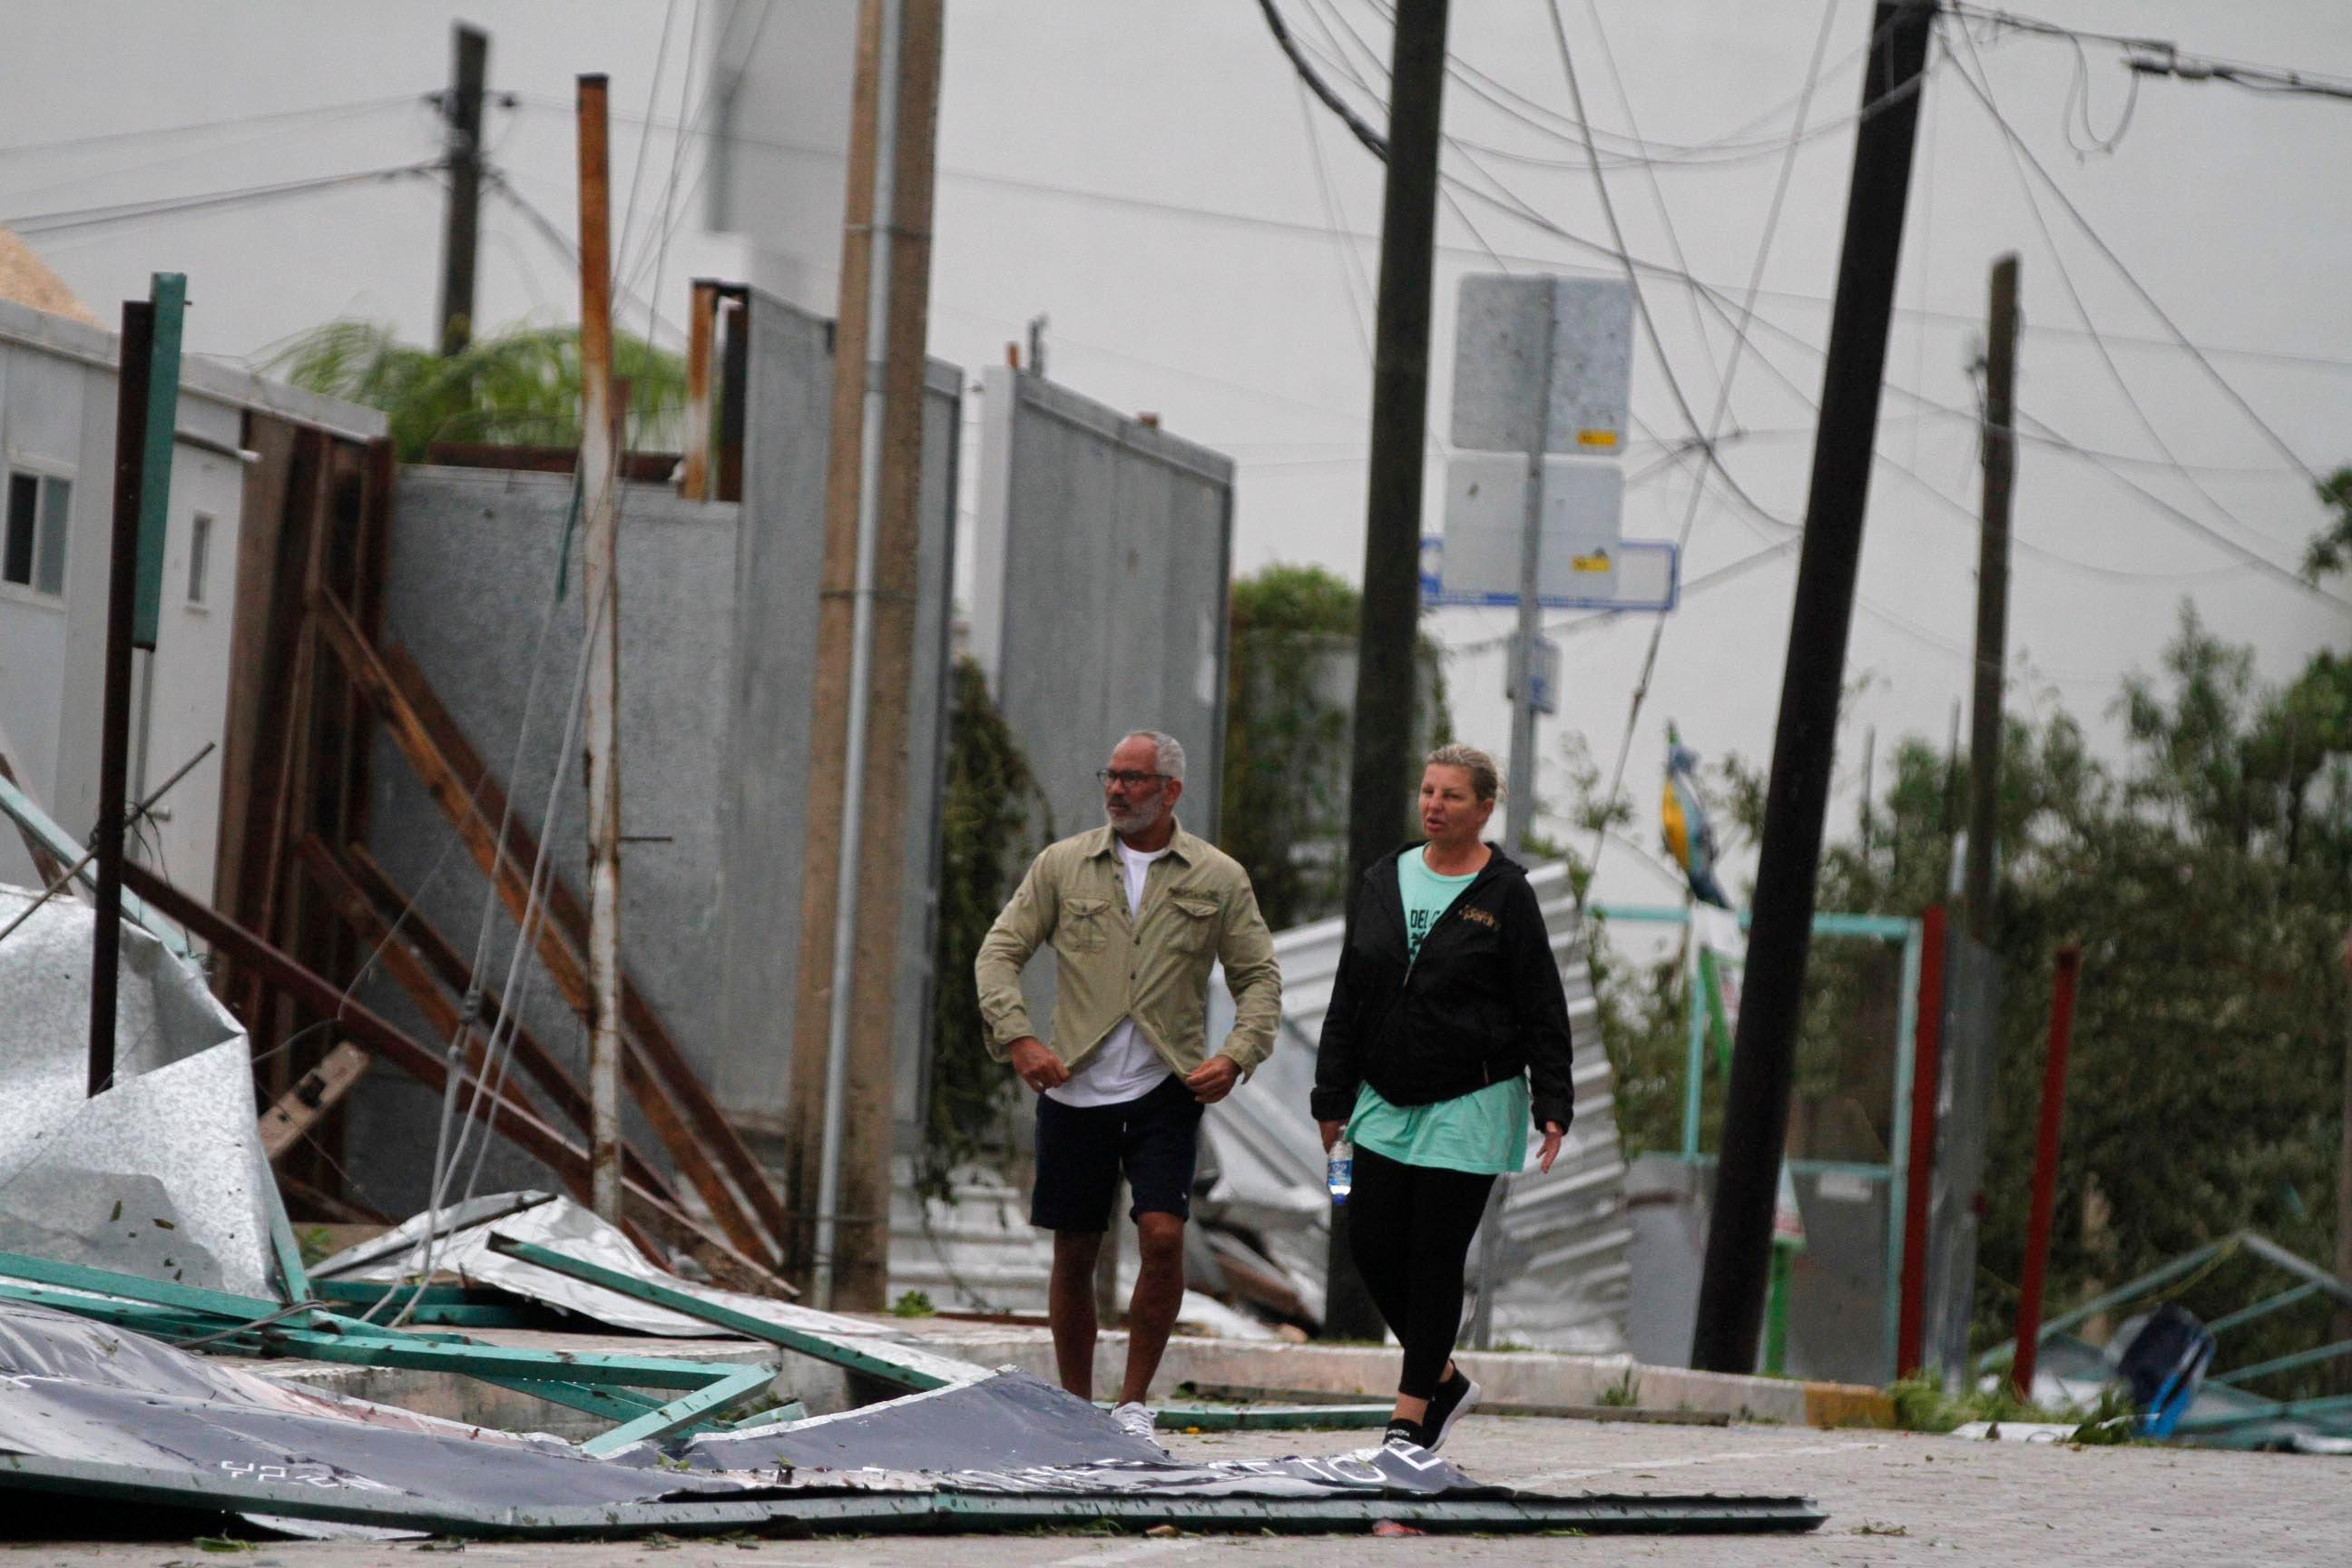 Live Updates: Zeta nearing northern Gulf Coast, life threatening storm surge expected